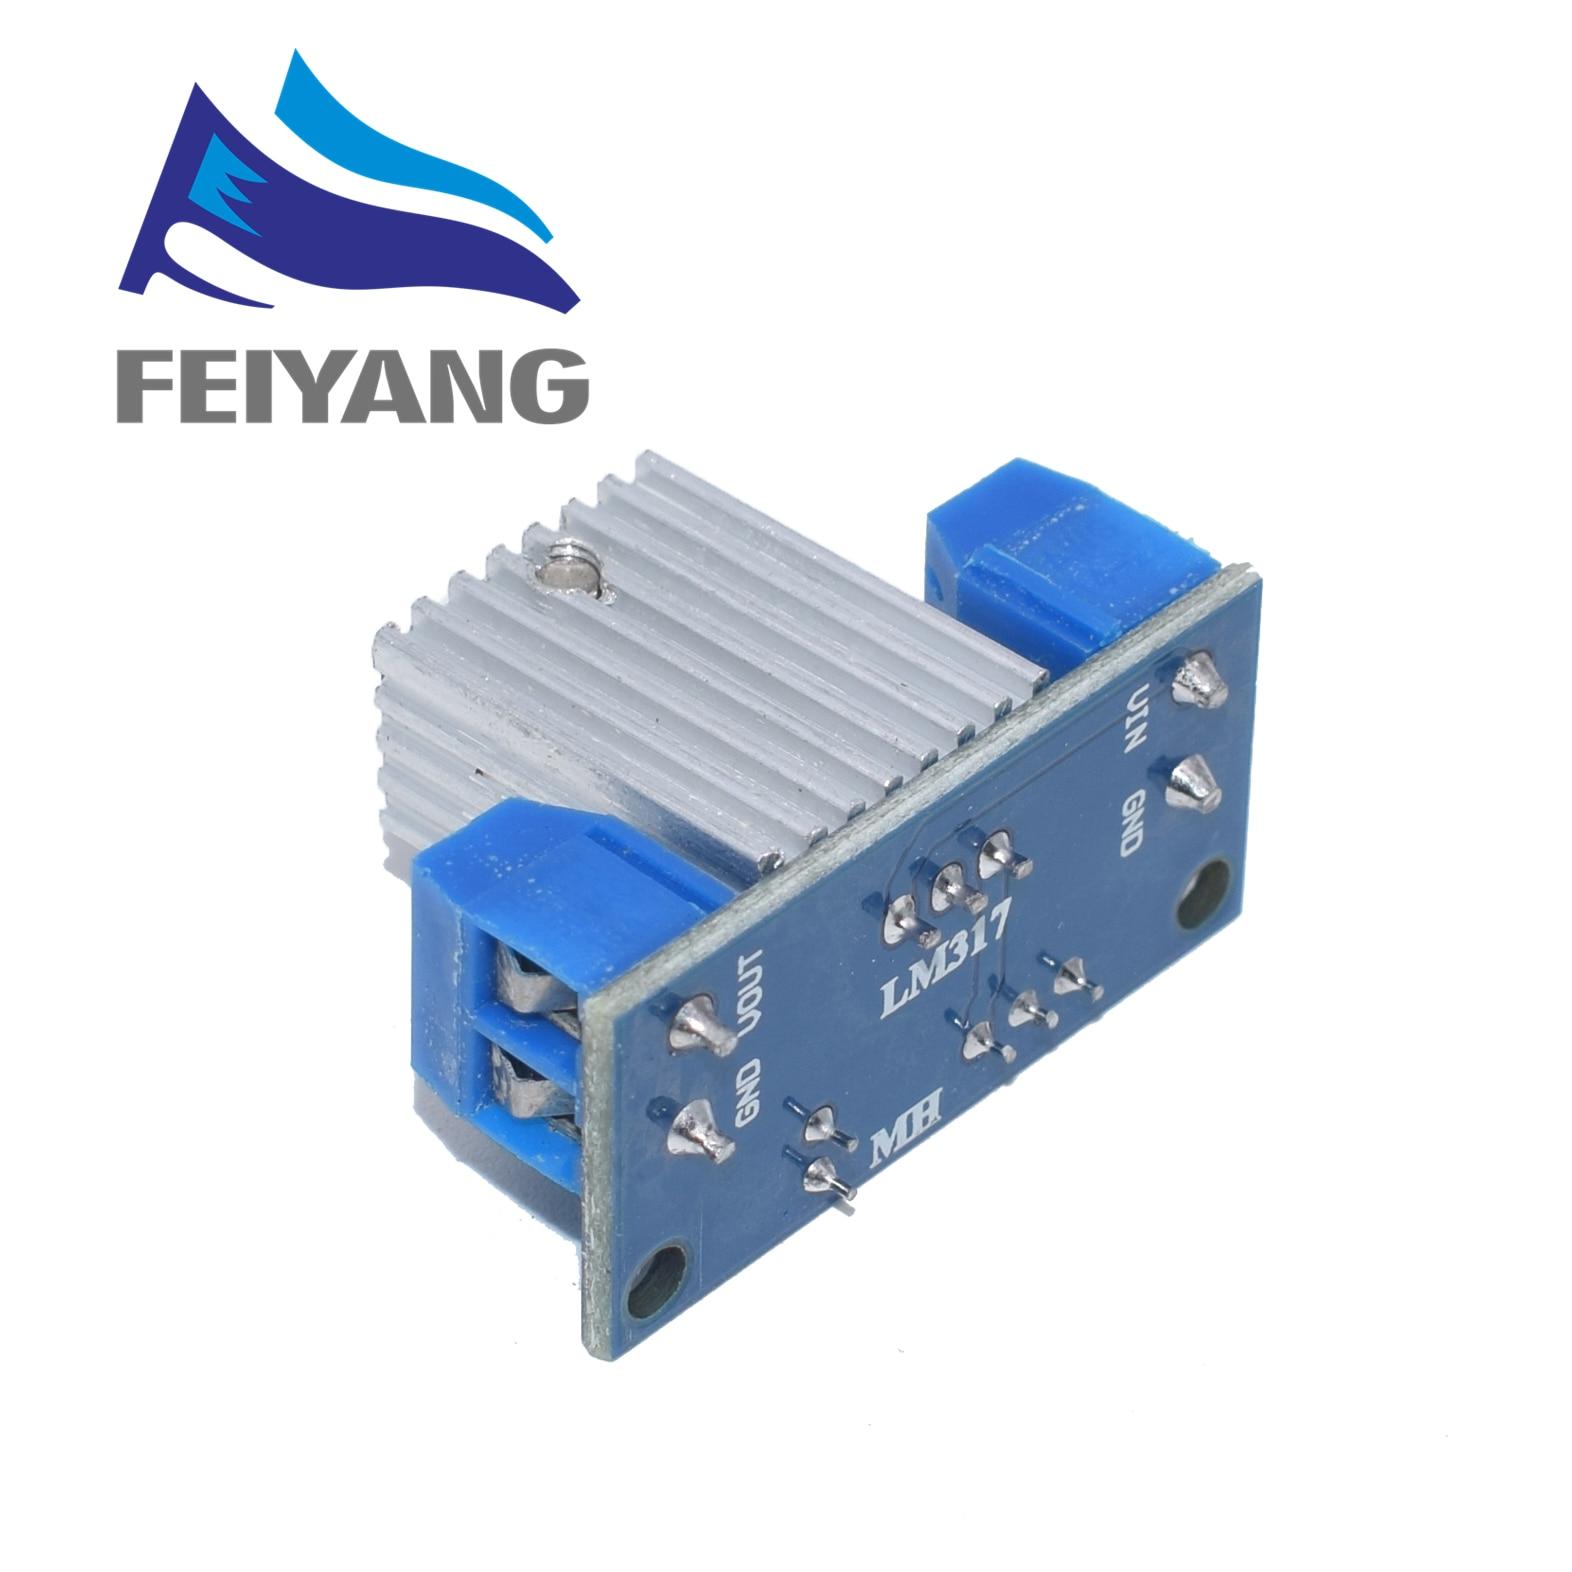 100PCS LM317 Adjustable Voltage Regulator Power Supply DC-DC Converter Buck Step Down Circuit Board Module Linear Regulator